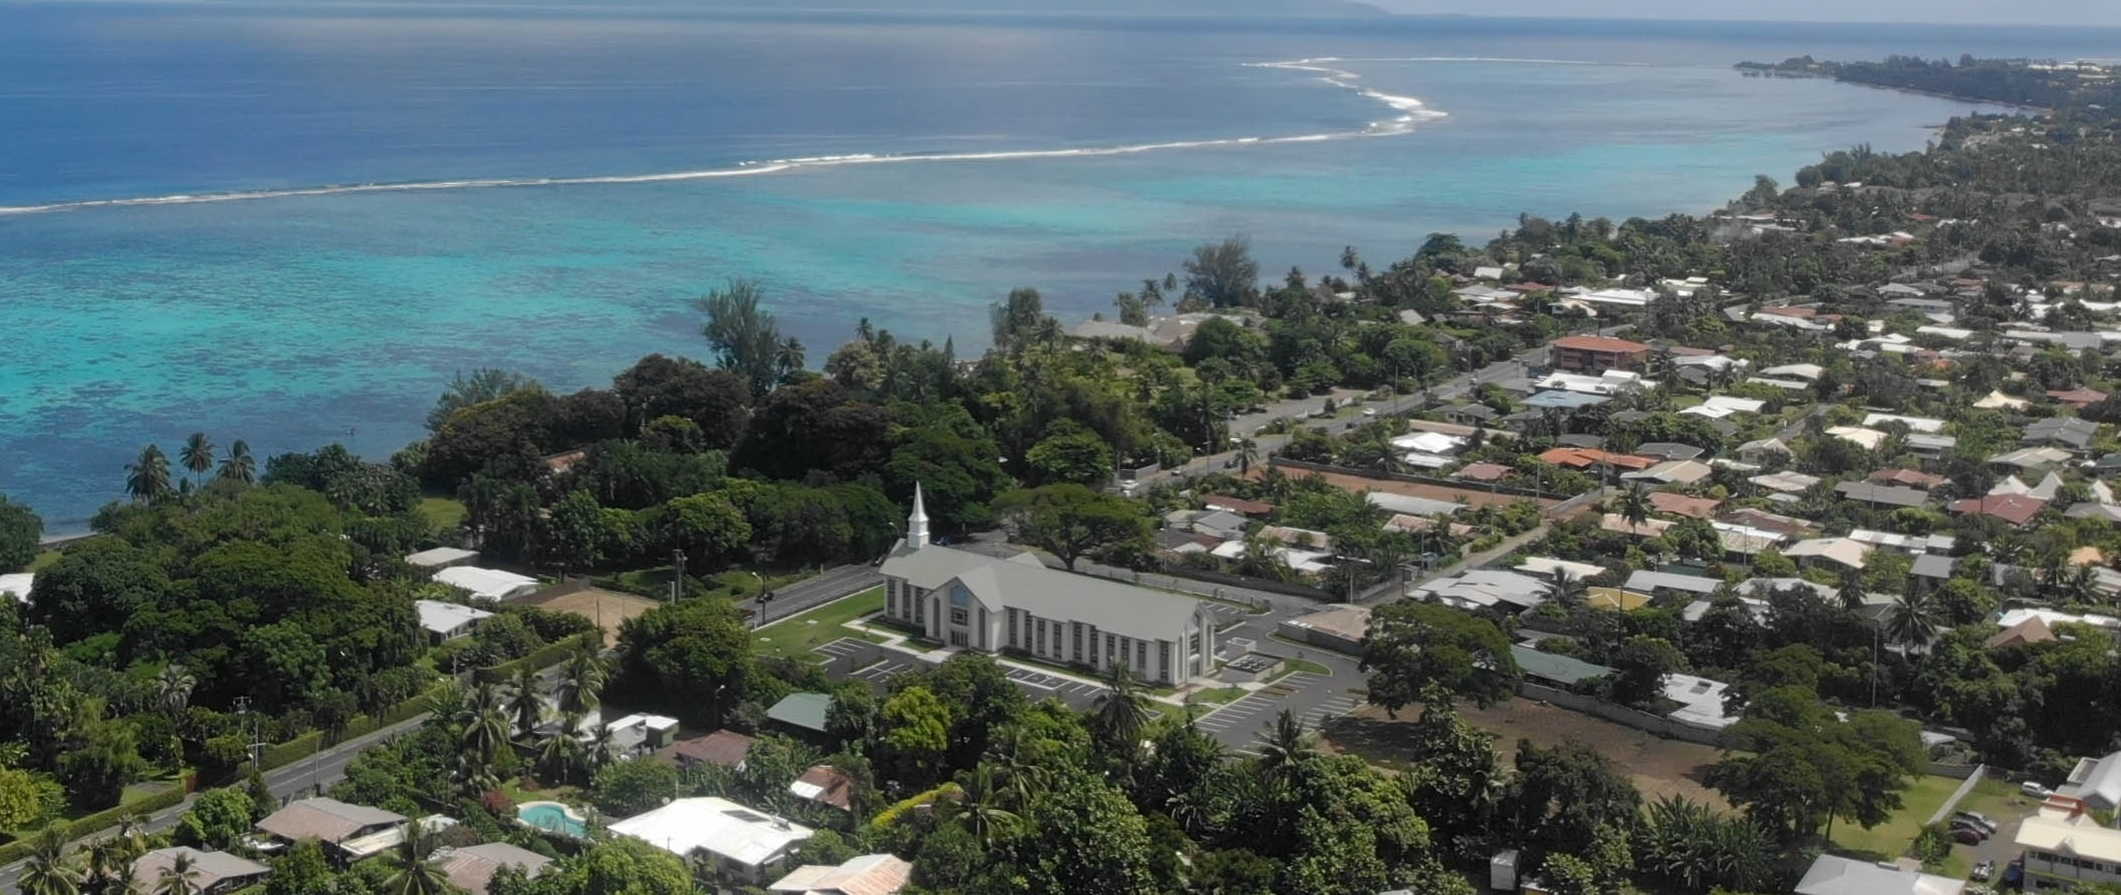 Tahiti - punauia vue du ciel